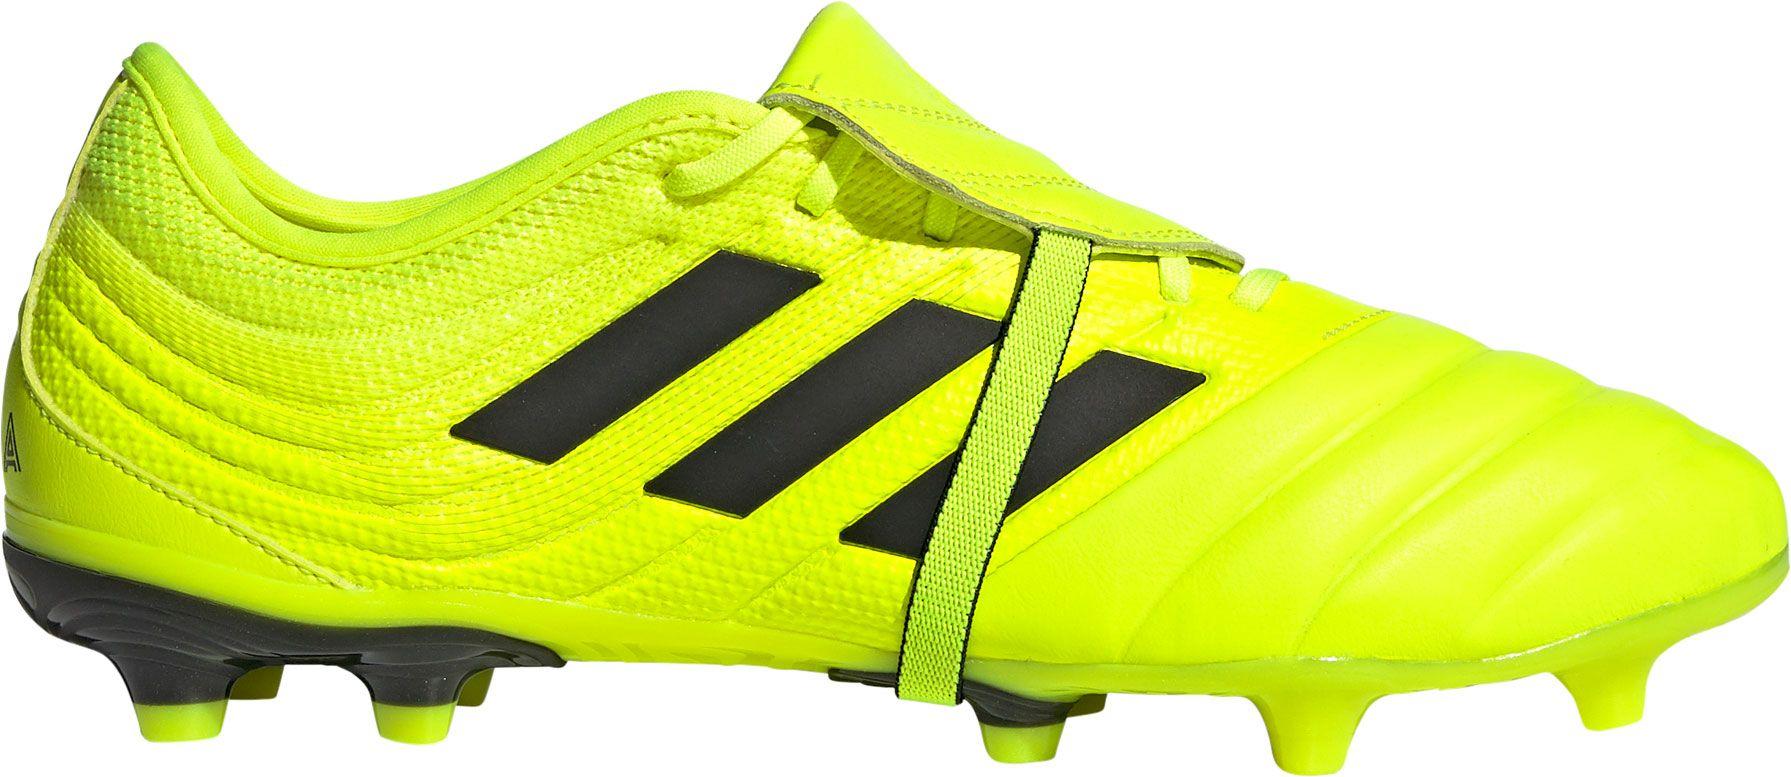 adidas Men's Copa Gloro 19.2 FG Soccer Cleats, Size: 13.0, Yellow